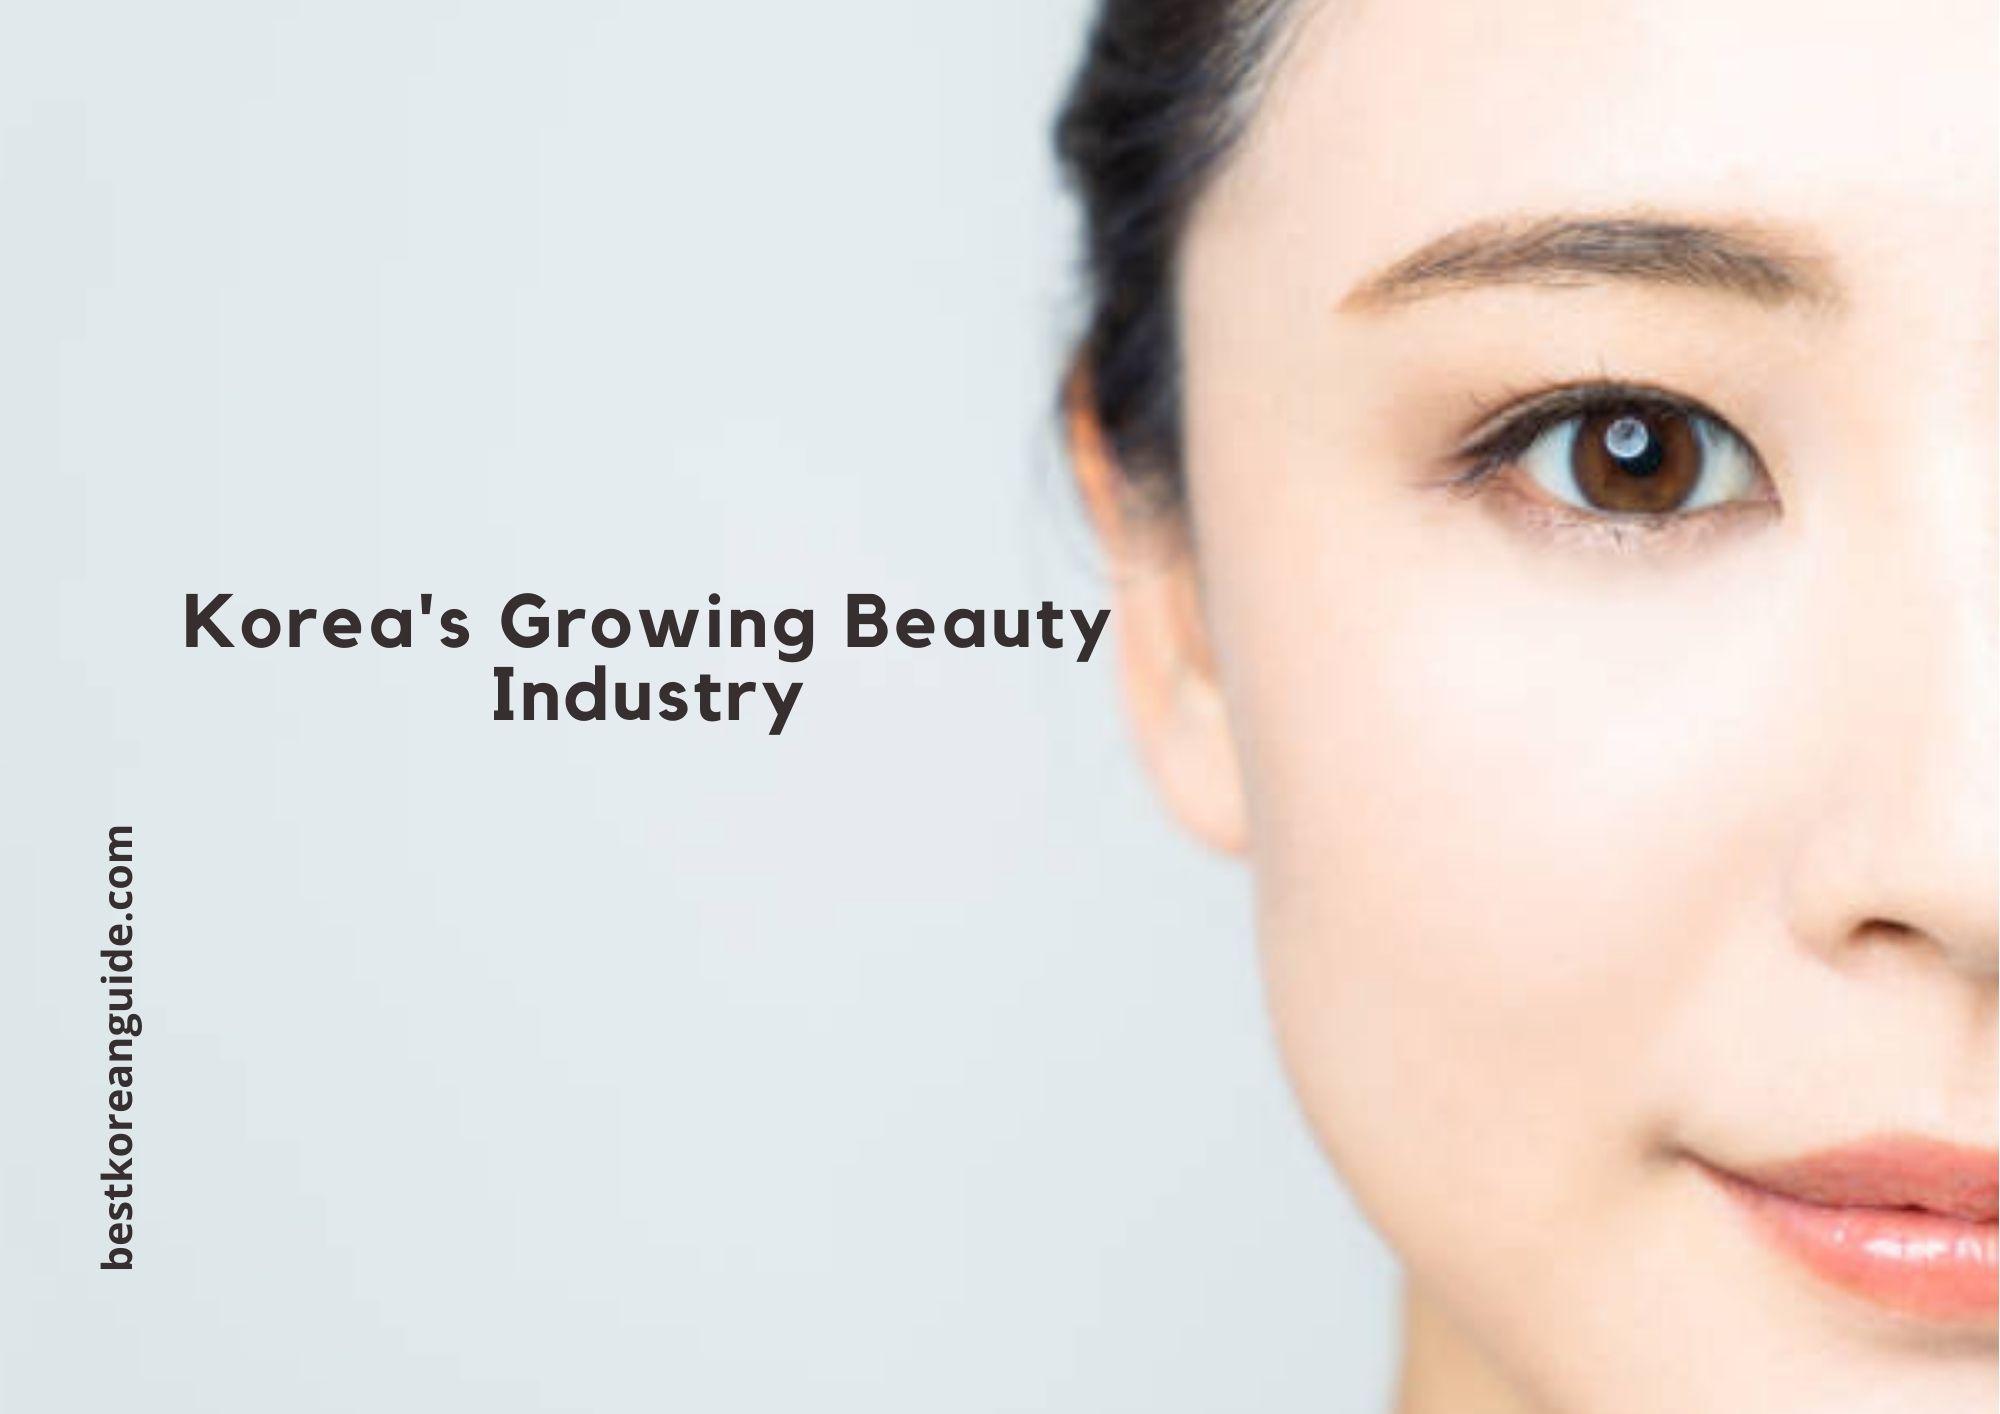 Korea's Growing Beauty Industry